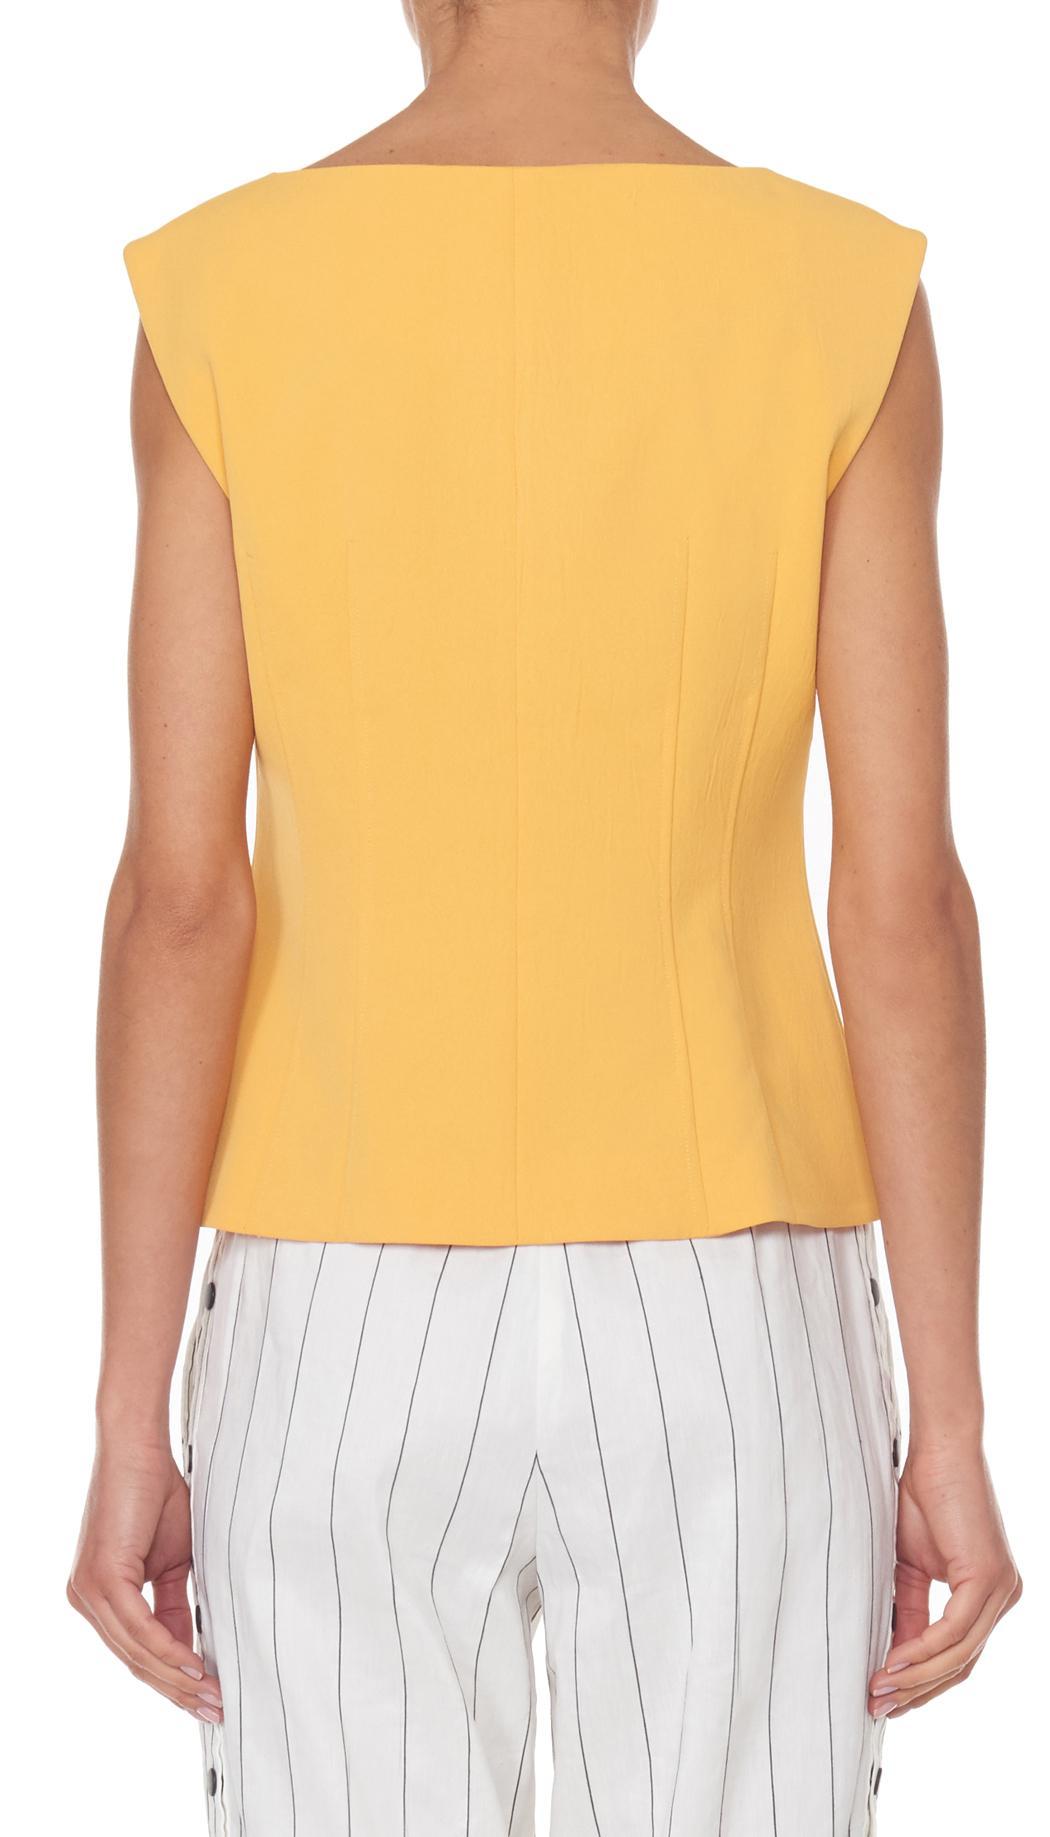 Tibi Synthetic Drape Twill Sleeveless Corset Top in Orange